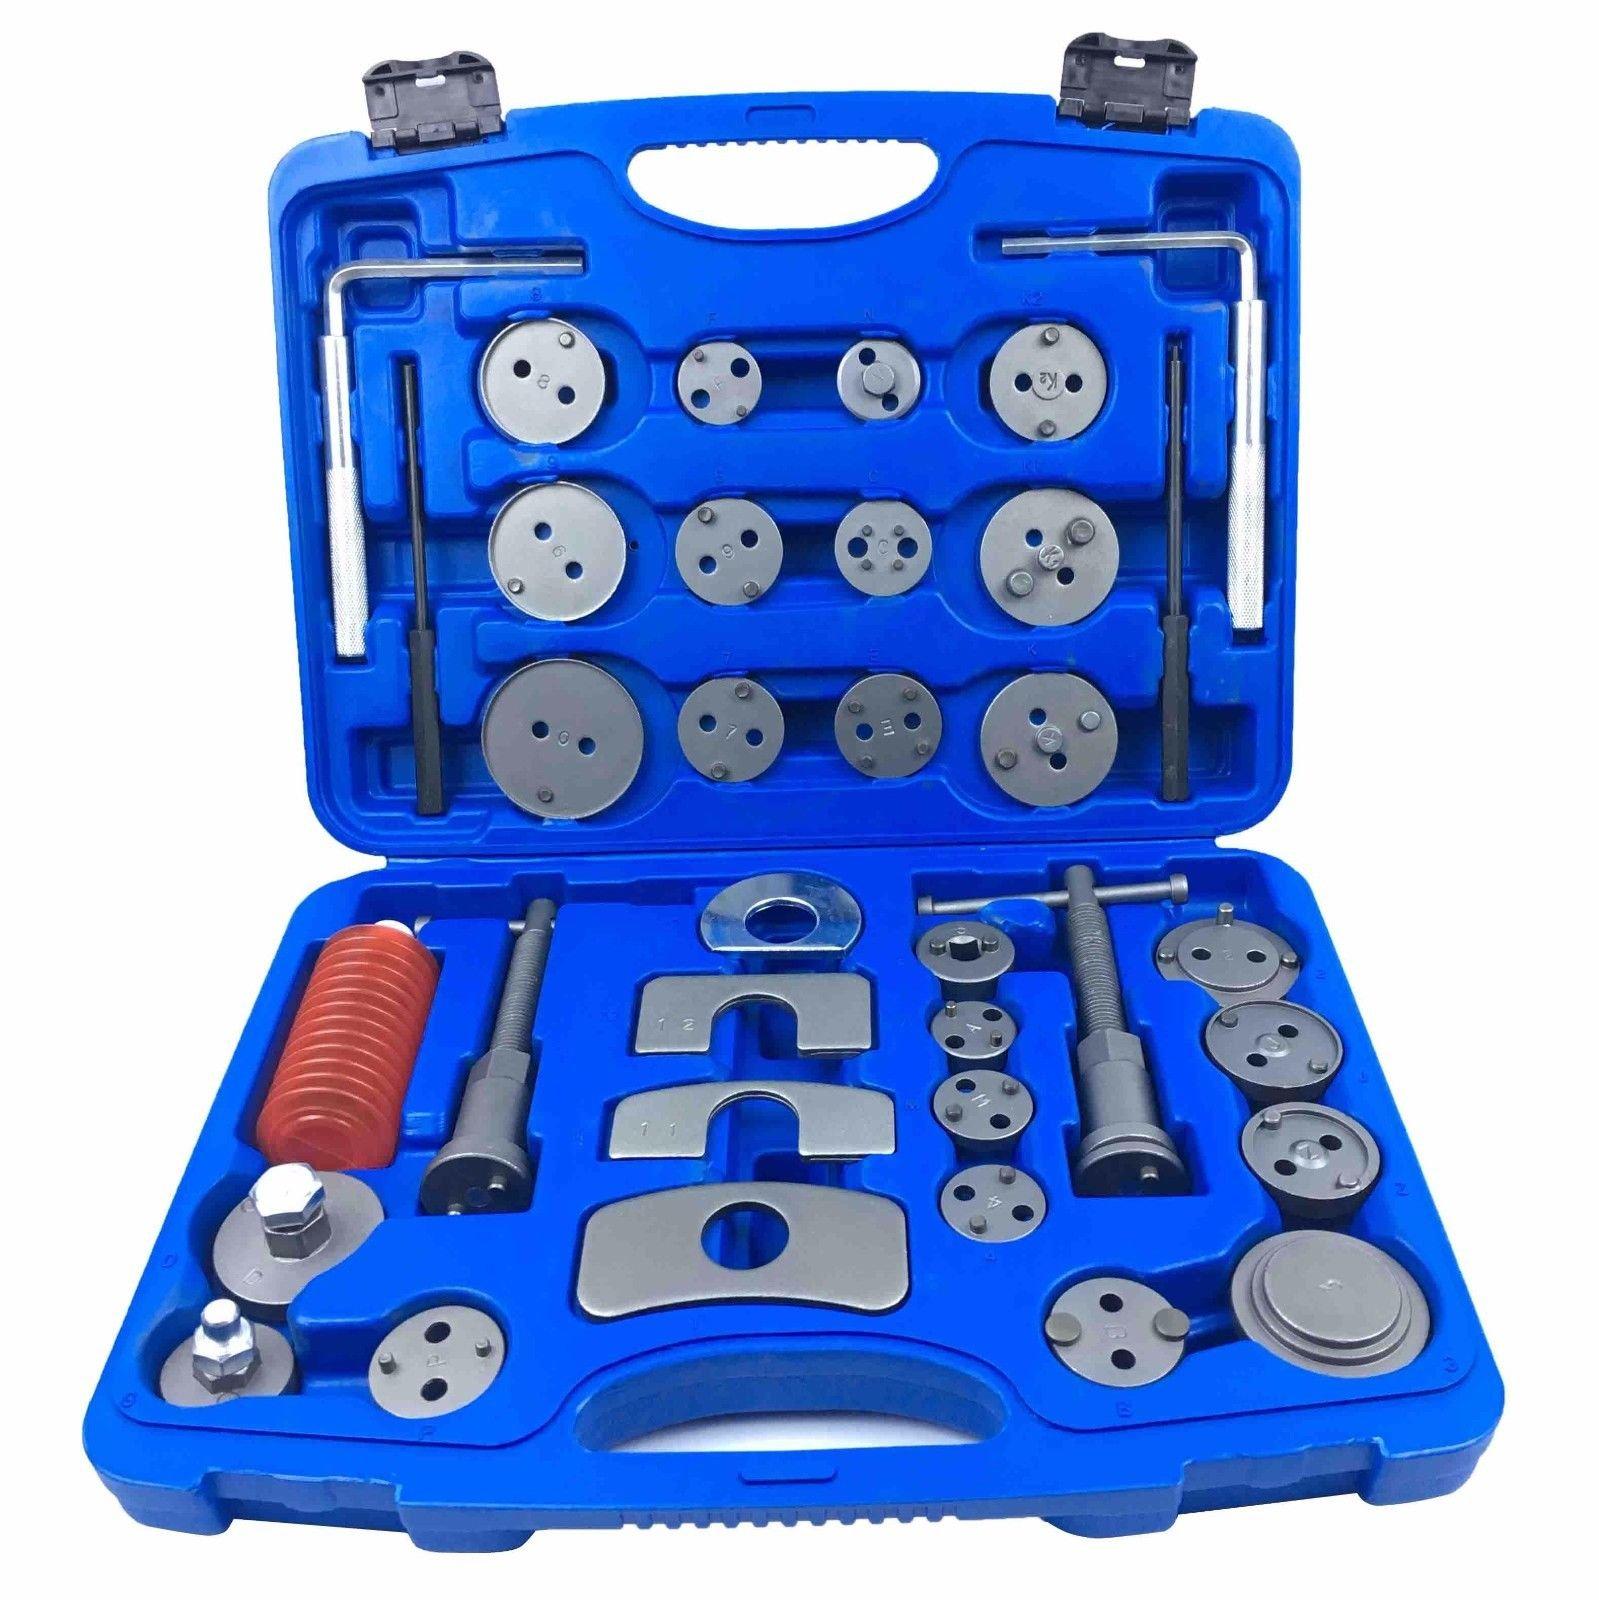 Brake Disc Caliper Wind Back Tool Kit - 35 Piece Universal Piston Rewind Set - Discs Break Pad Caliper Compressor Service Tools - by Jecr (Image #9)